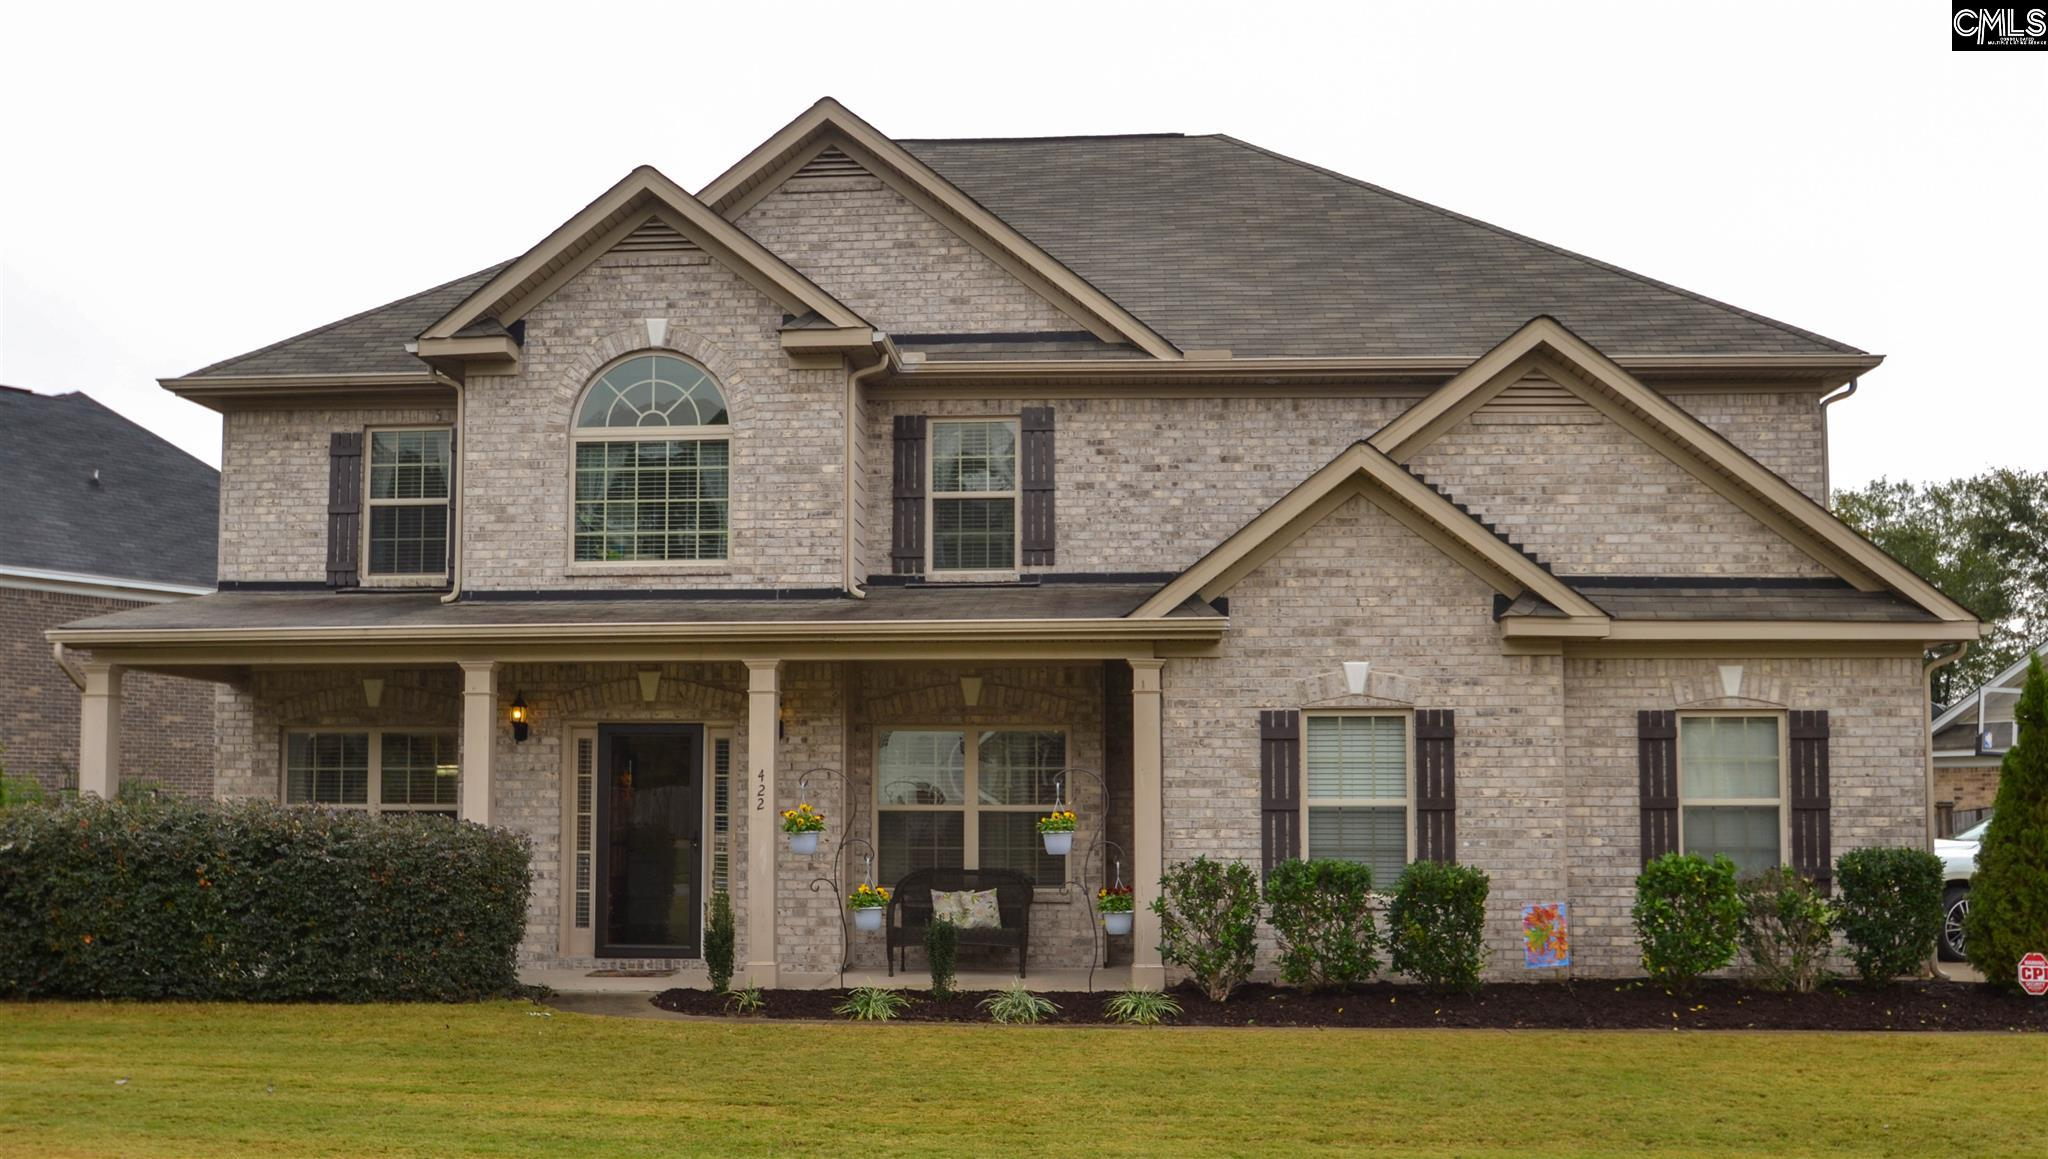 422 Flagstone Ct Lexington, SC 29072